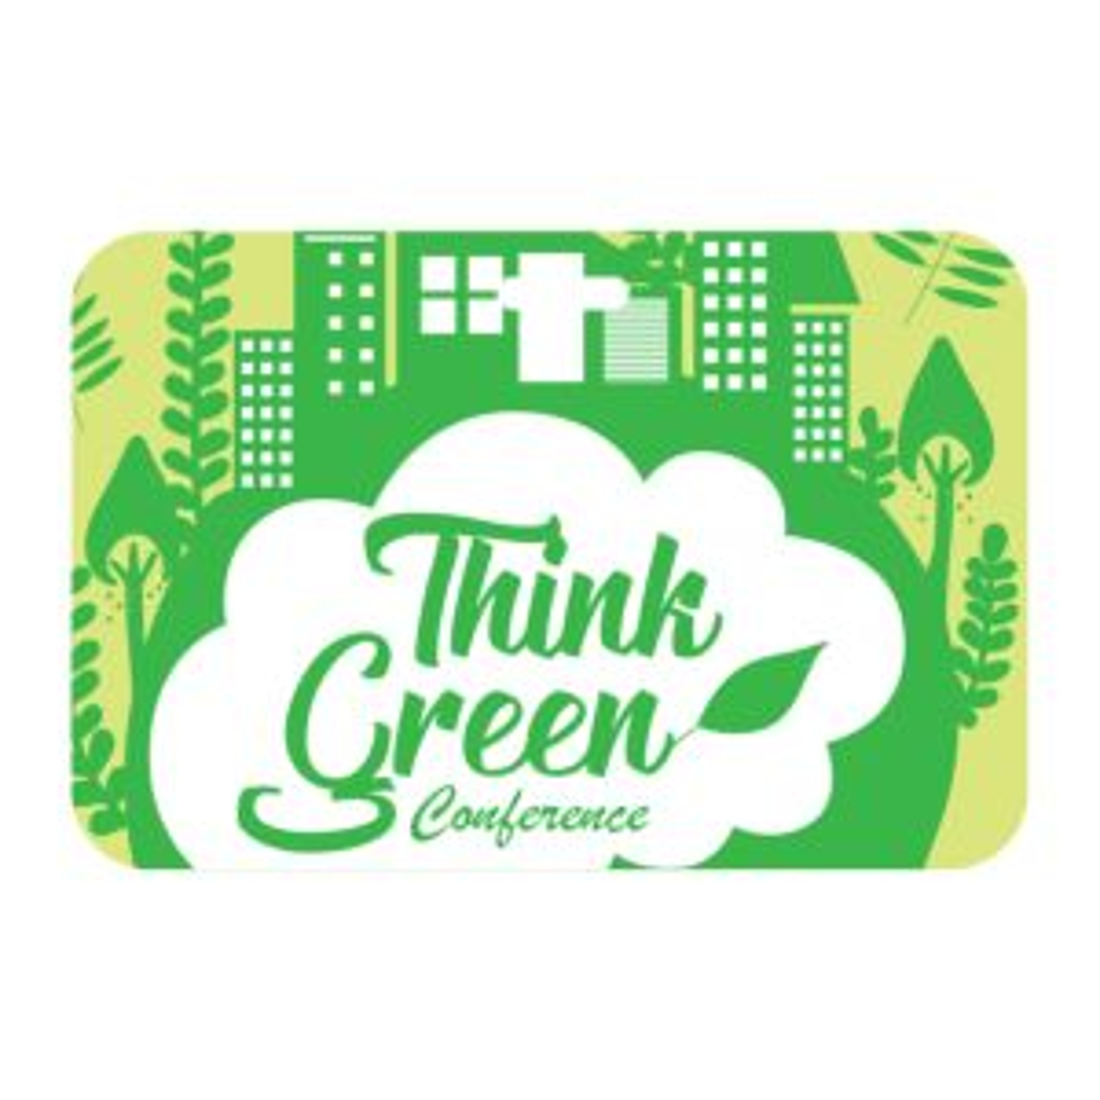 "3-1/2"" x 2-1/4"" Eco Event Pass, Plastic (Synthetic)"